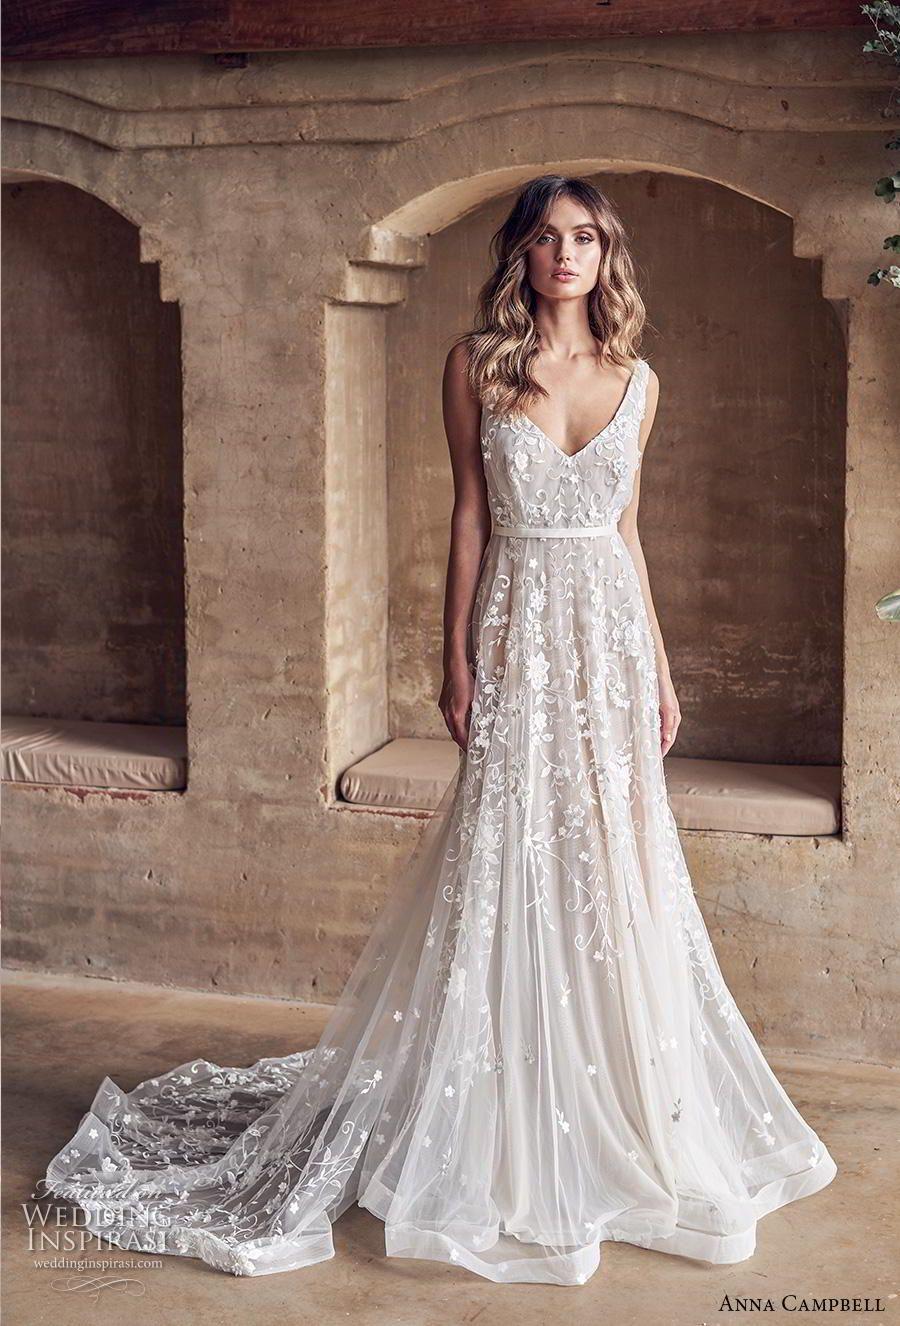 Redneck wedding dress  Anna Campbell  Wedding Dresses u ucWanderlustud Bridal Collection